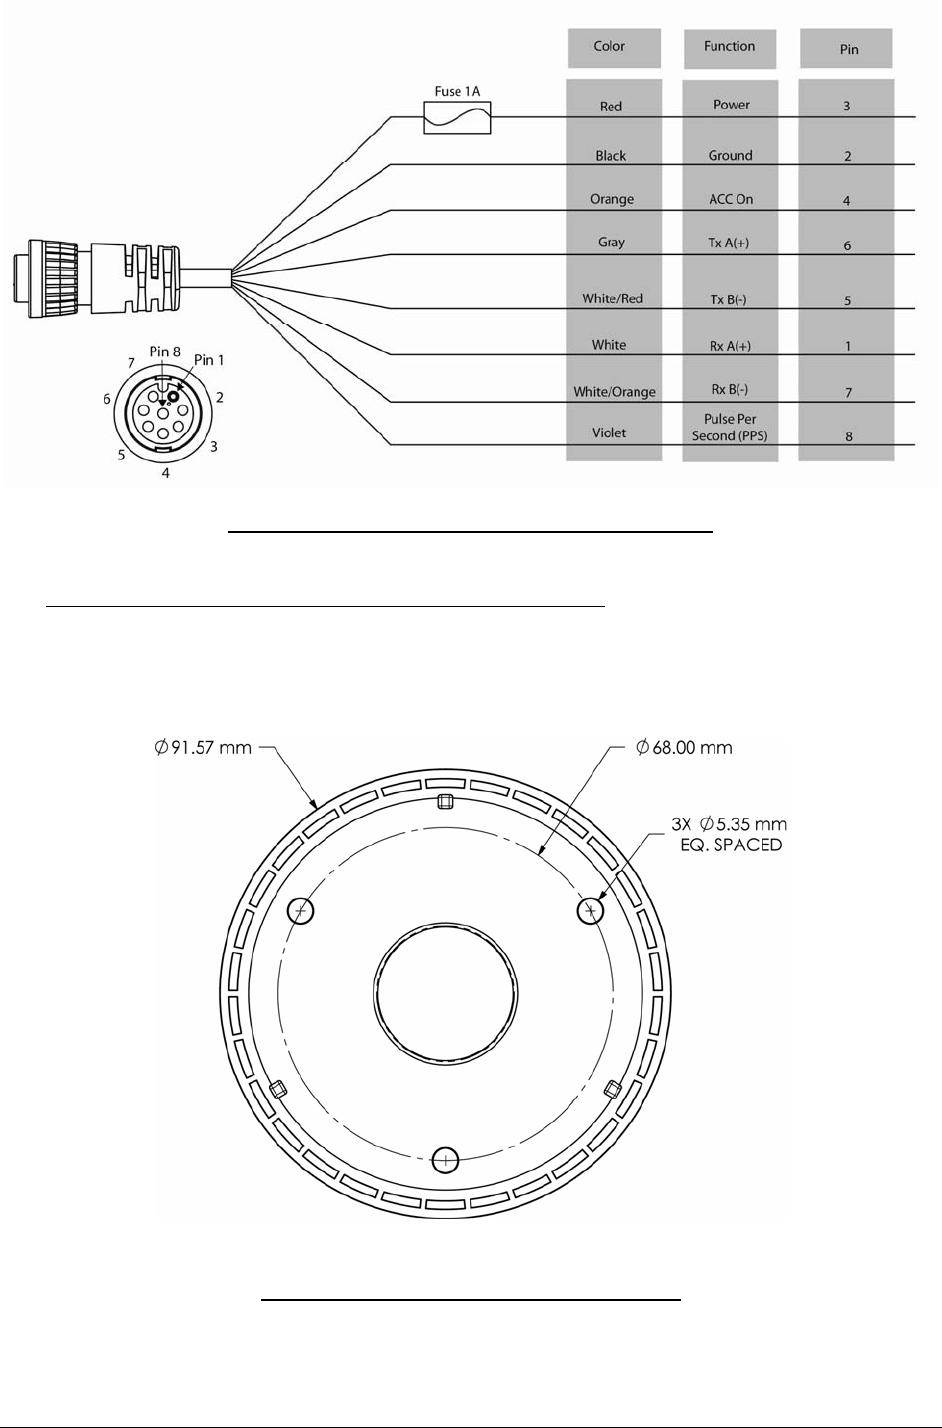 Garmin Hvs Gps17 Users Manual Nmea Gps 0183 Wiring Diagram 17x Power Data Cable